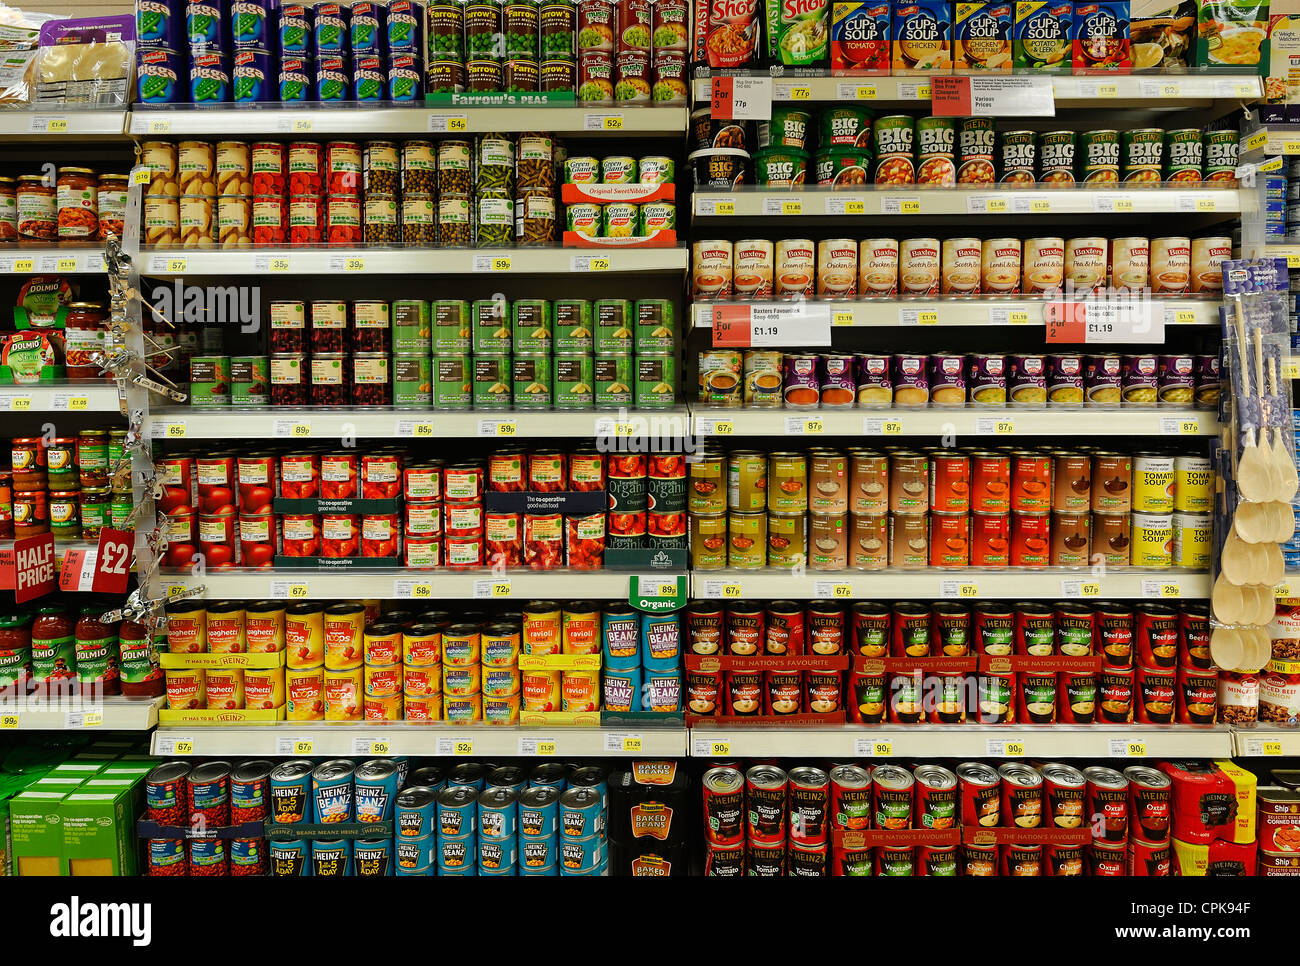 Tinned Food Aisle of a Supermarket, UK. - Stock Image